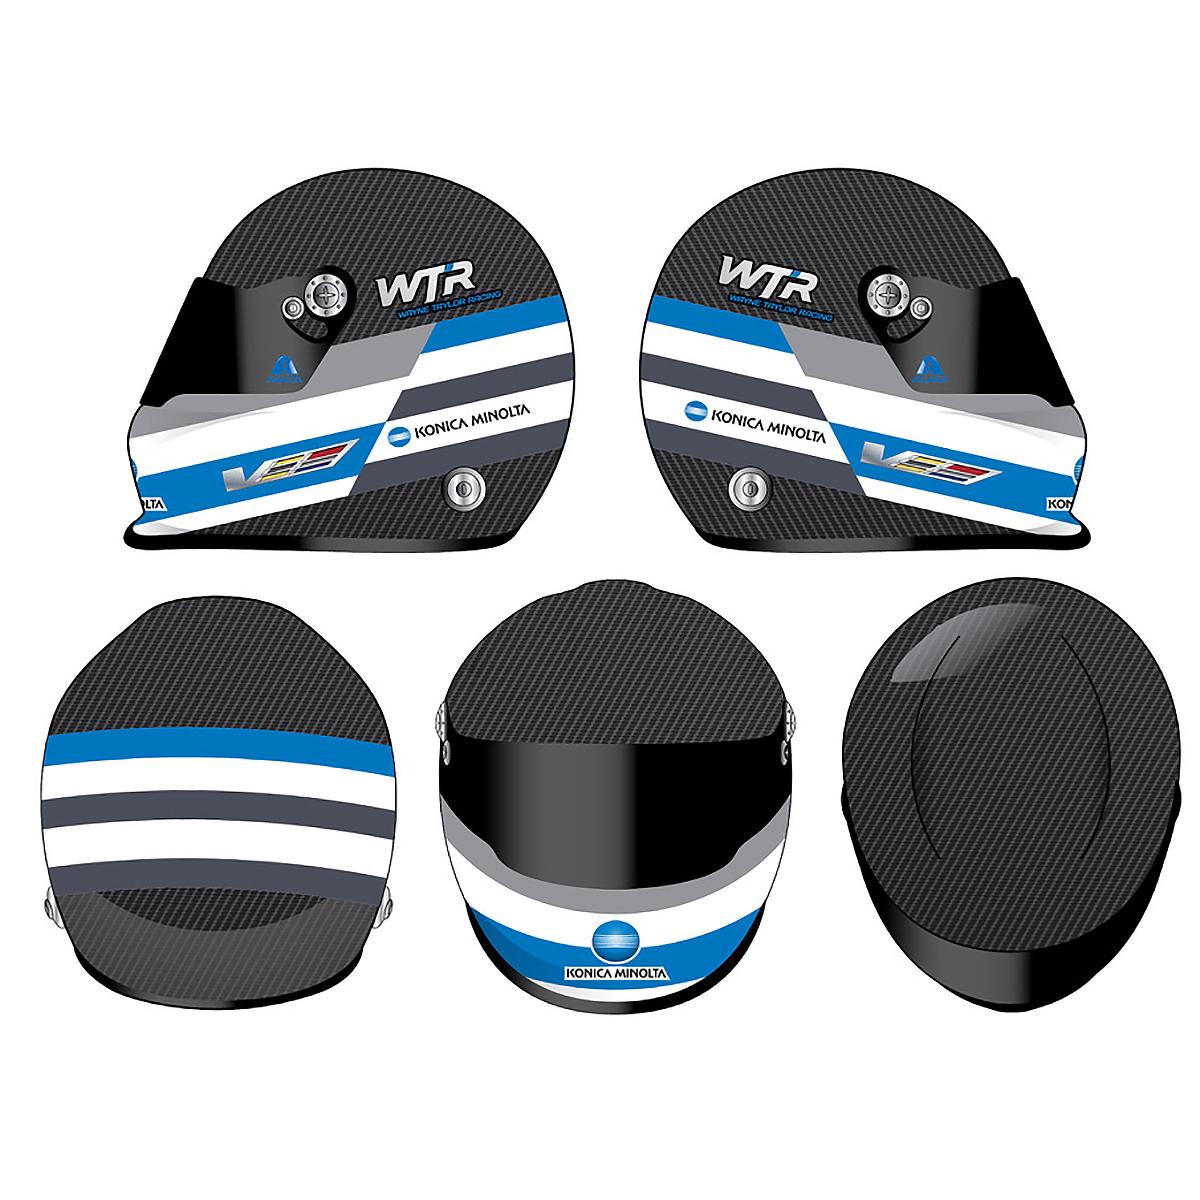 2017 Jeff Gordon Wayne Taylor Racing 24 Hours Full Size Replica Helmet